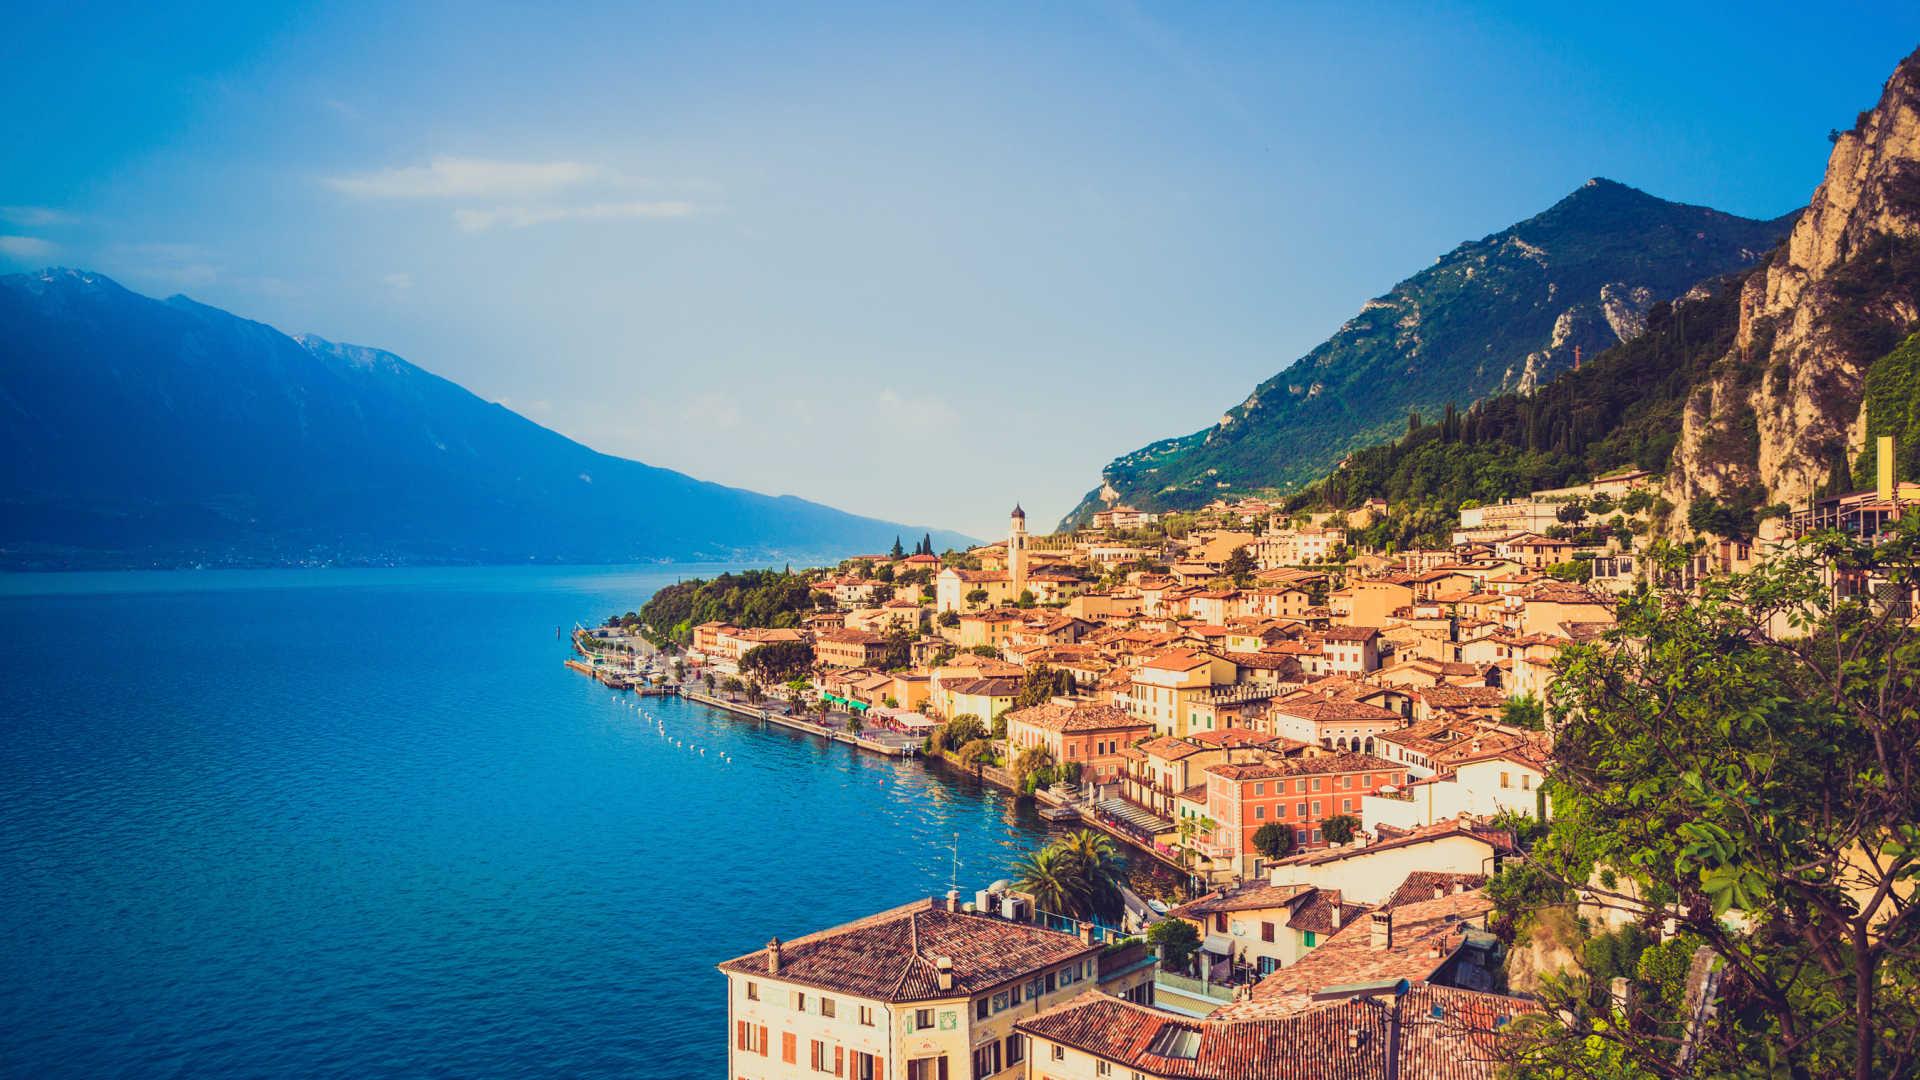 Hotel Alfieri, Lake Garda